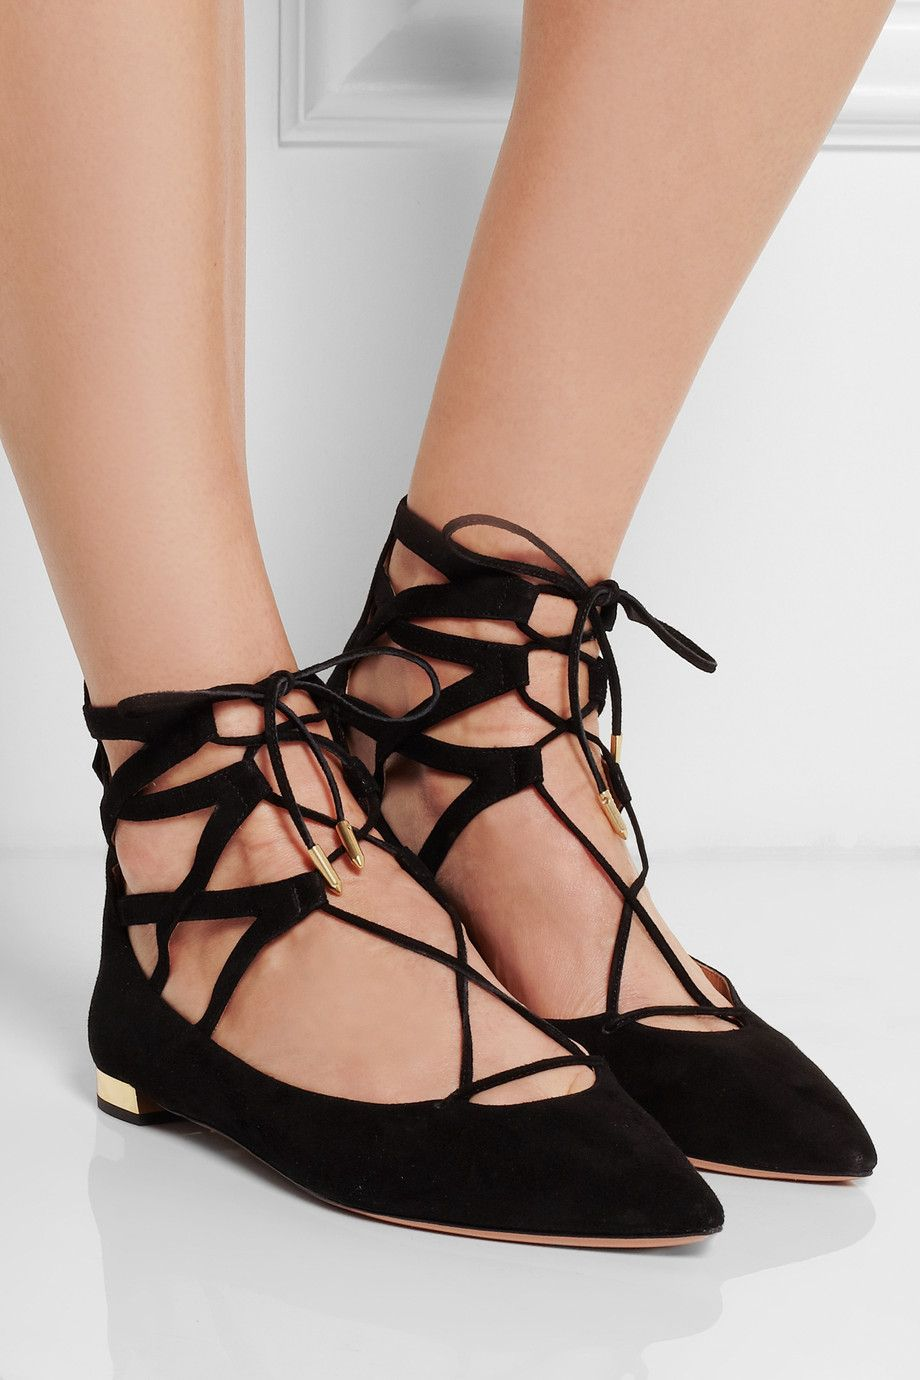 ca94a9ce1b622 Aquazzura   Belgravia lace-up suede point-toe flats   NET-A-PORTER ...